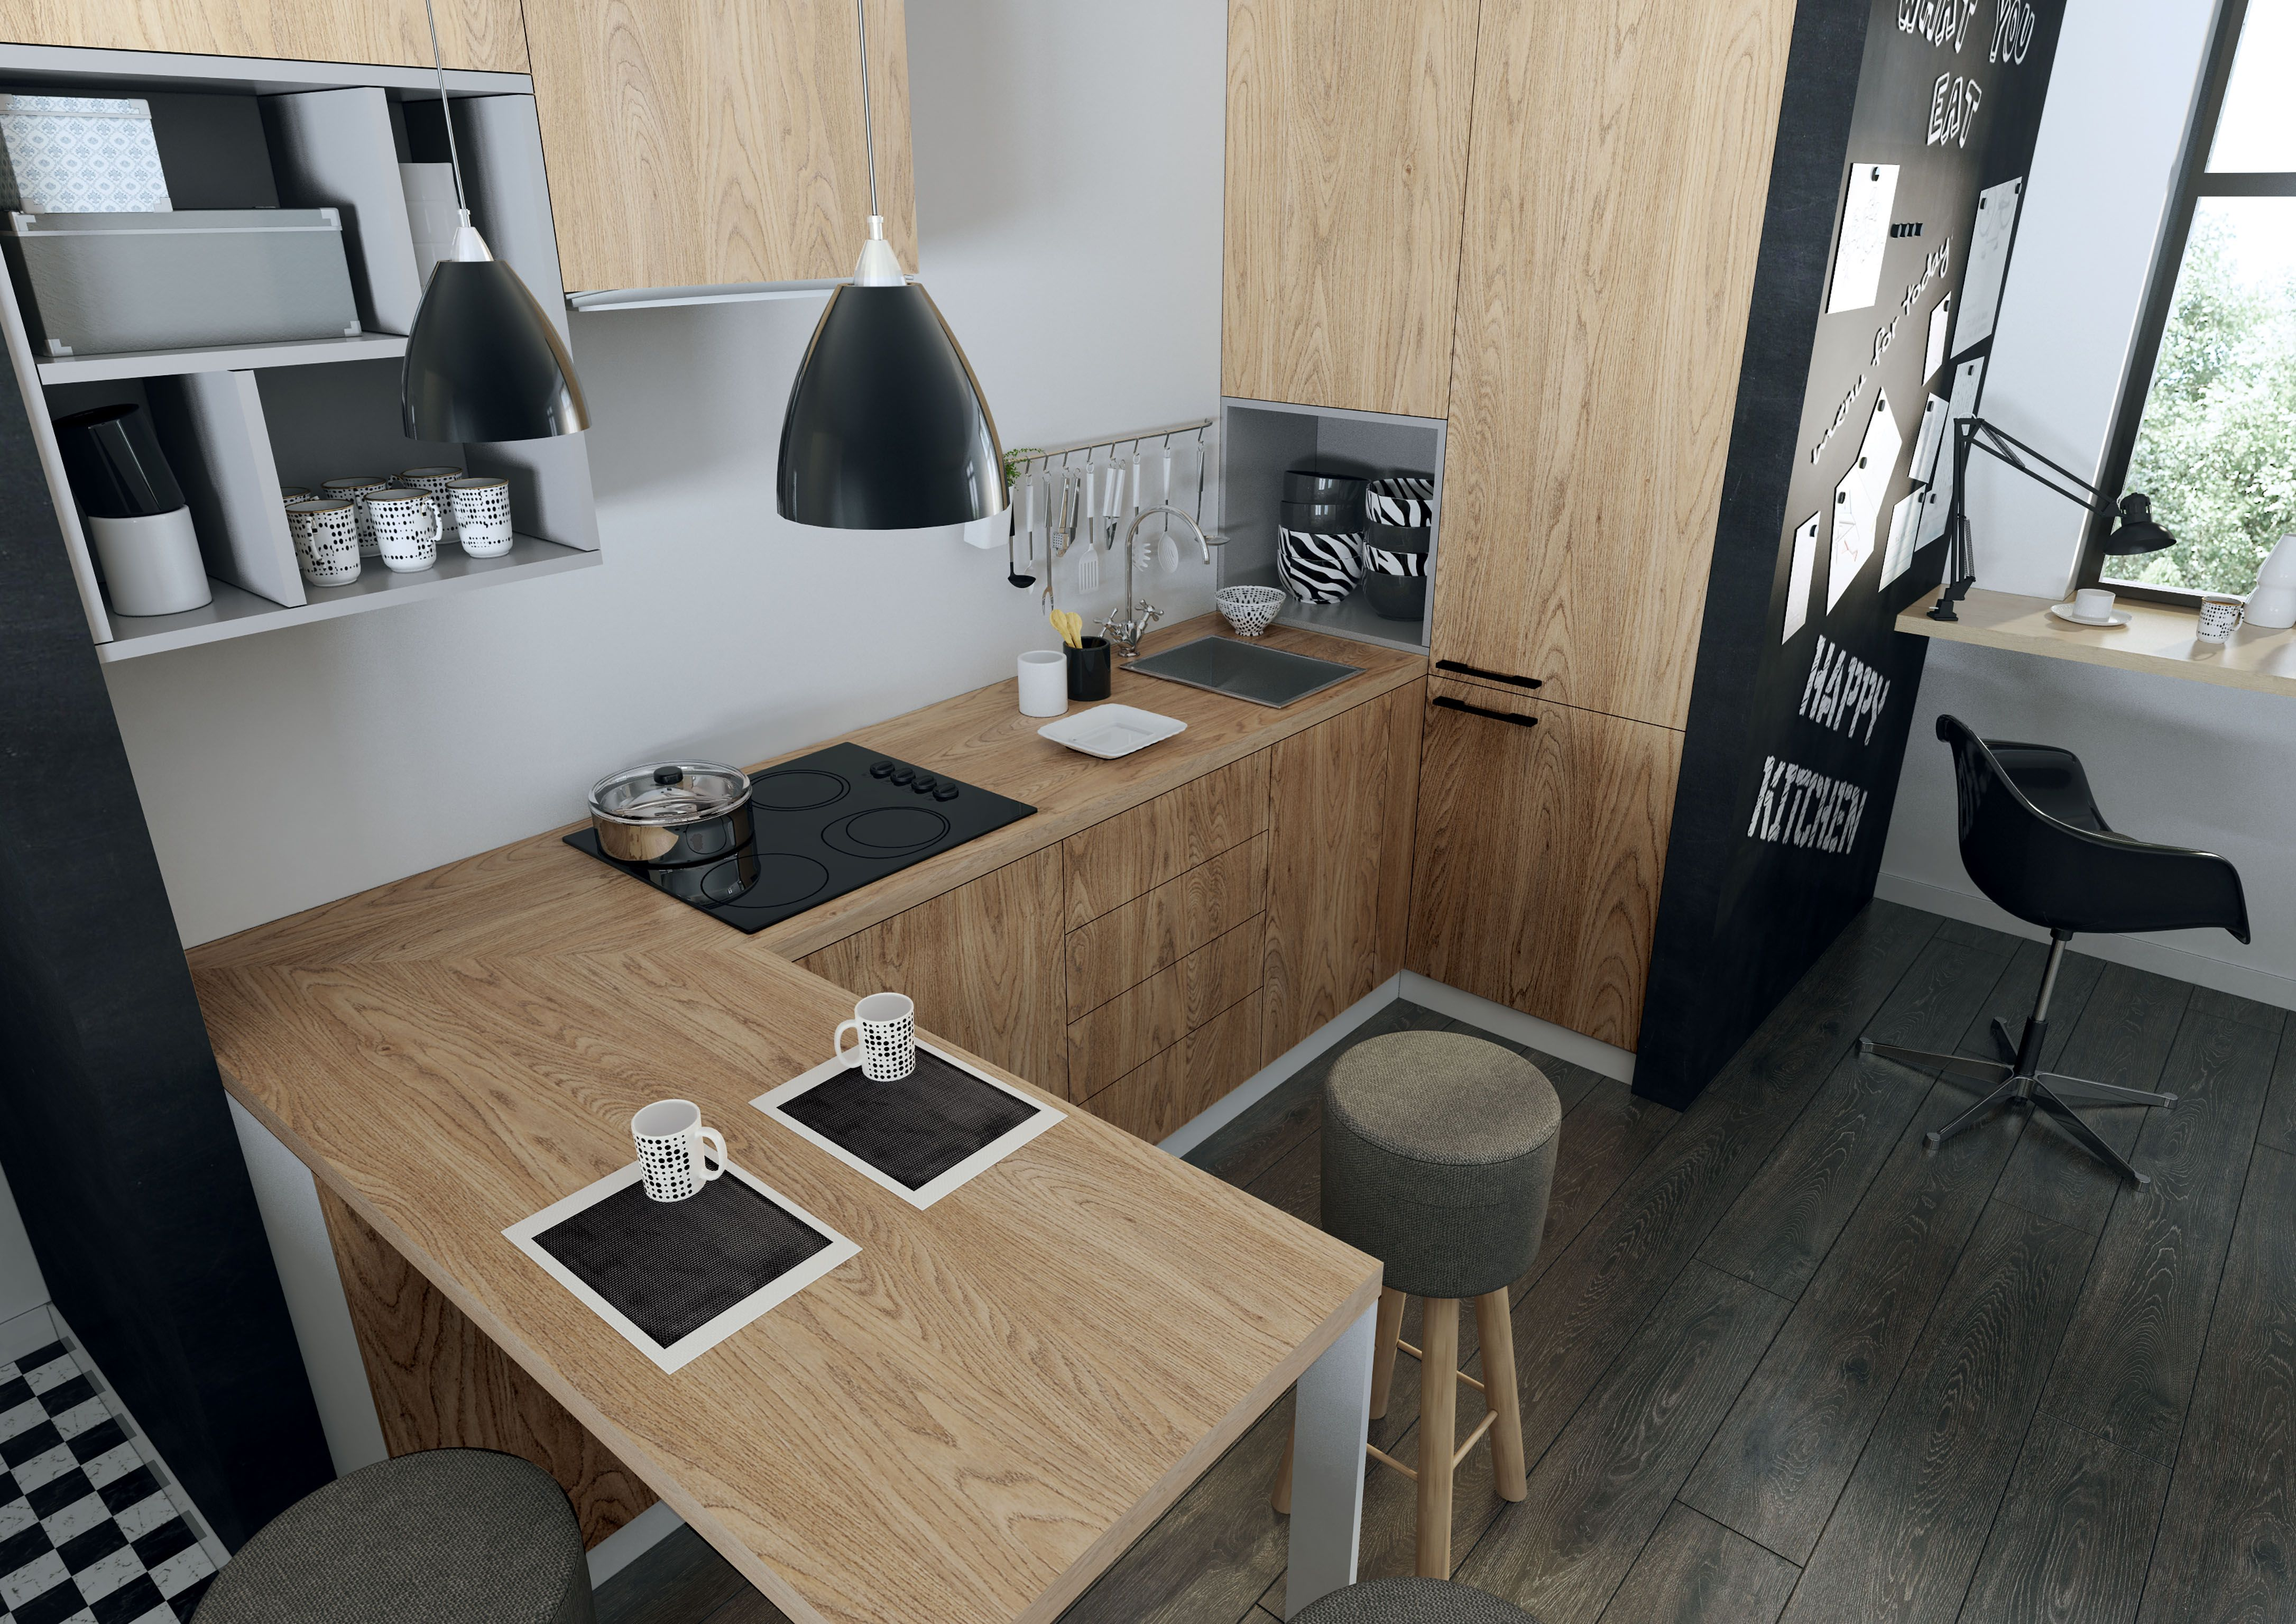 Blat Kuchenny Swiss Krono D3823 Ow Dab Nowy Jork Home Decor Furniture Decor